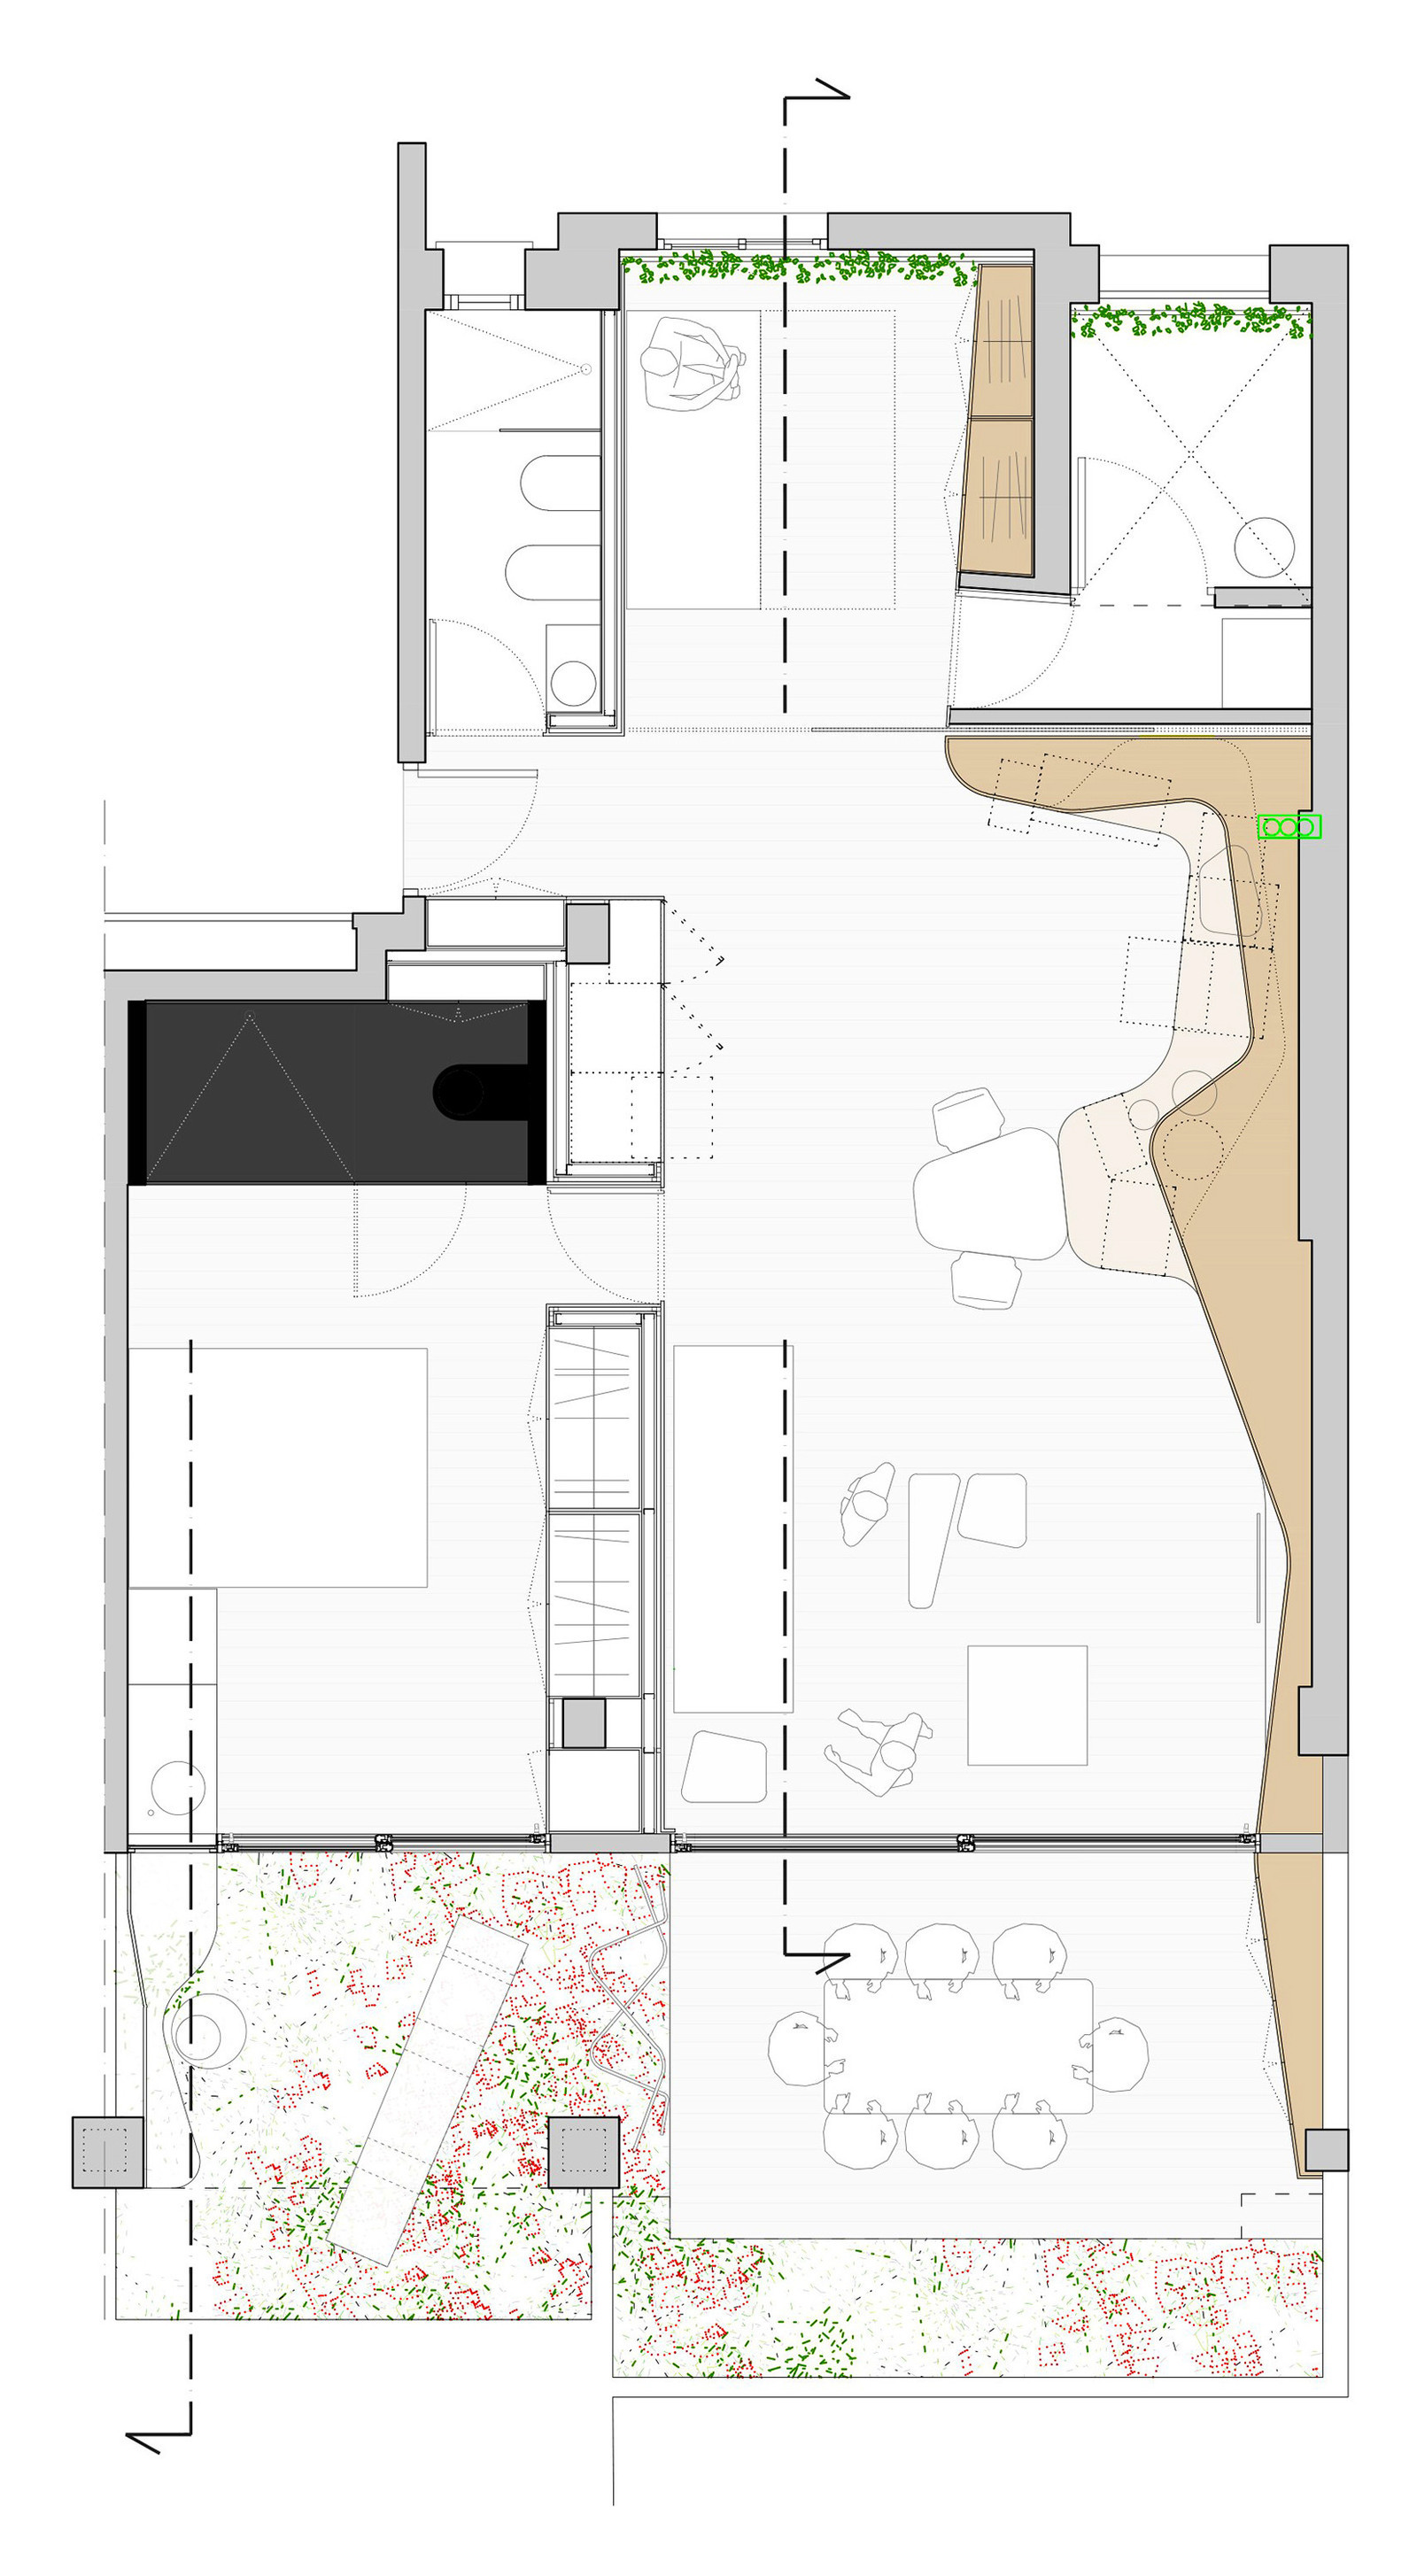 Casa-Weston-just3ds.com-12